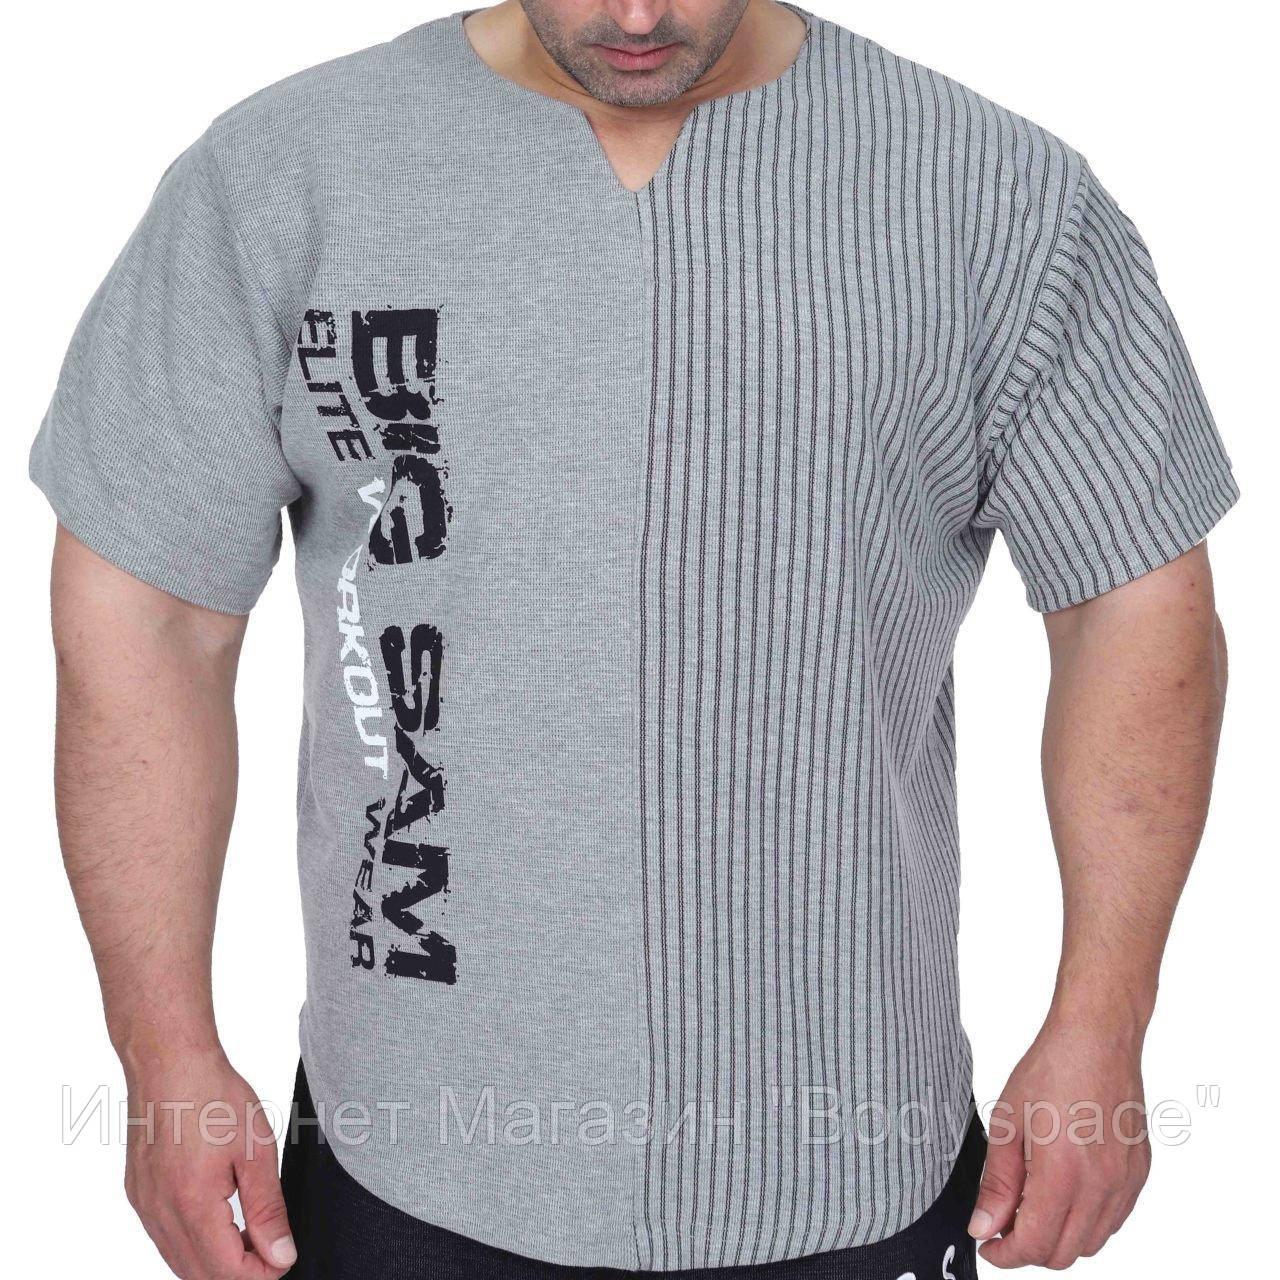 Big Sam, Размахайка Relaxed Fit Training T-Shirt Gray 3265, Сірий, 2XL